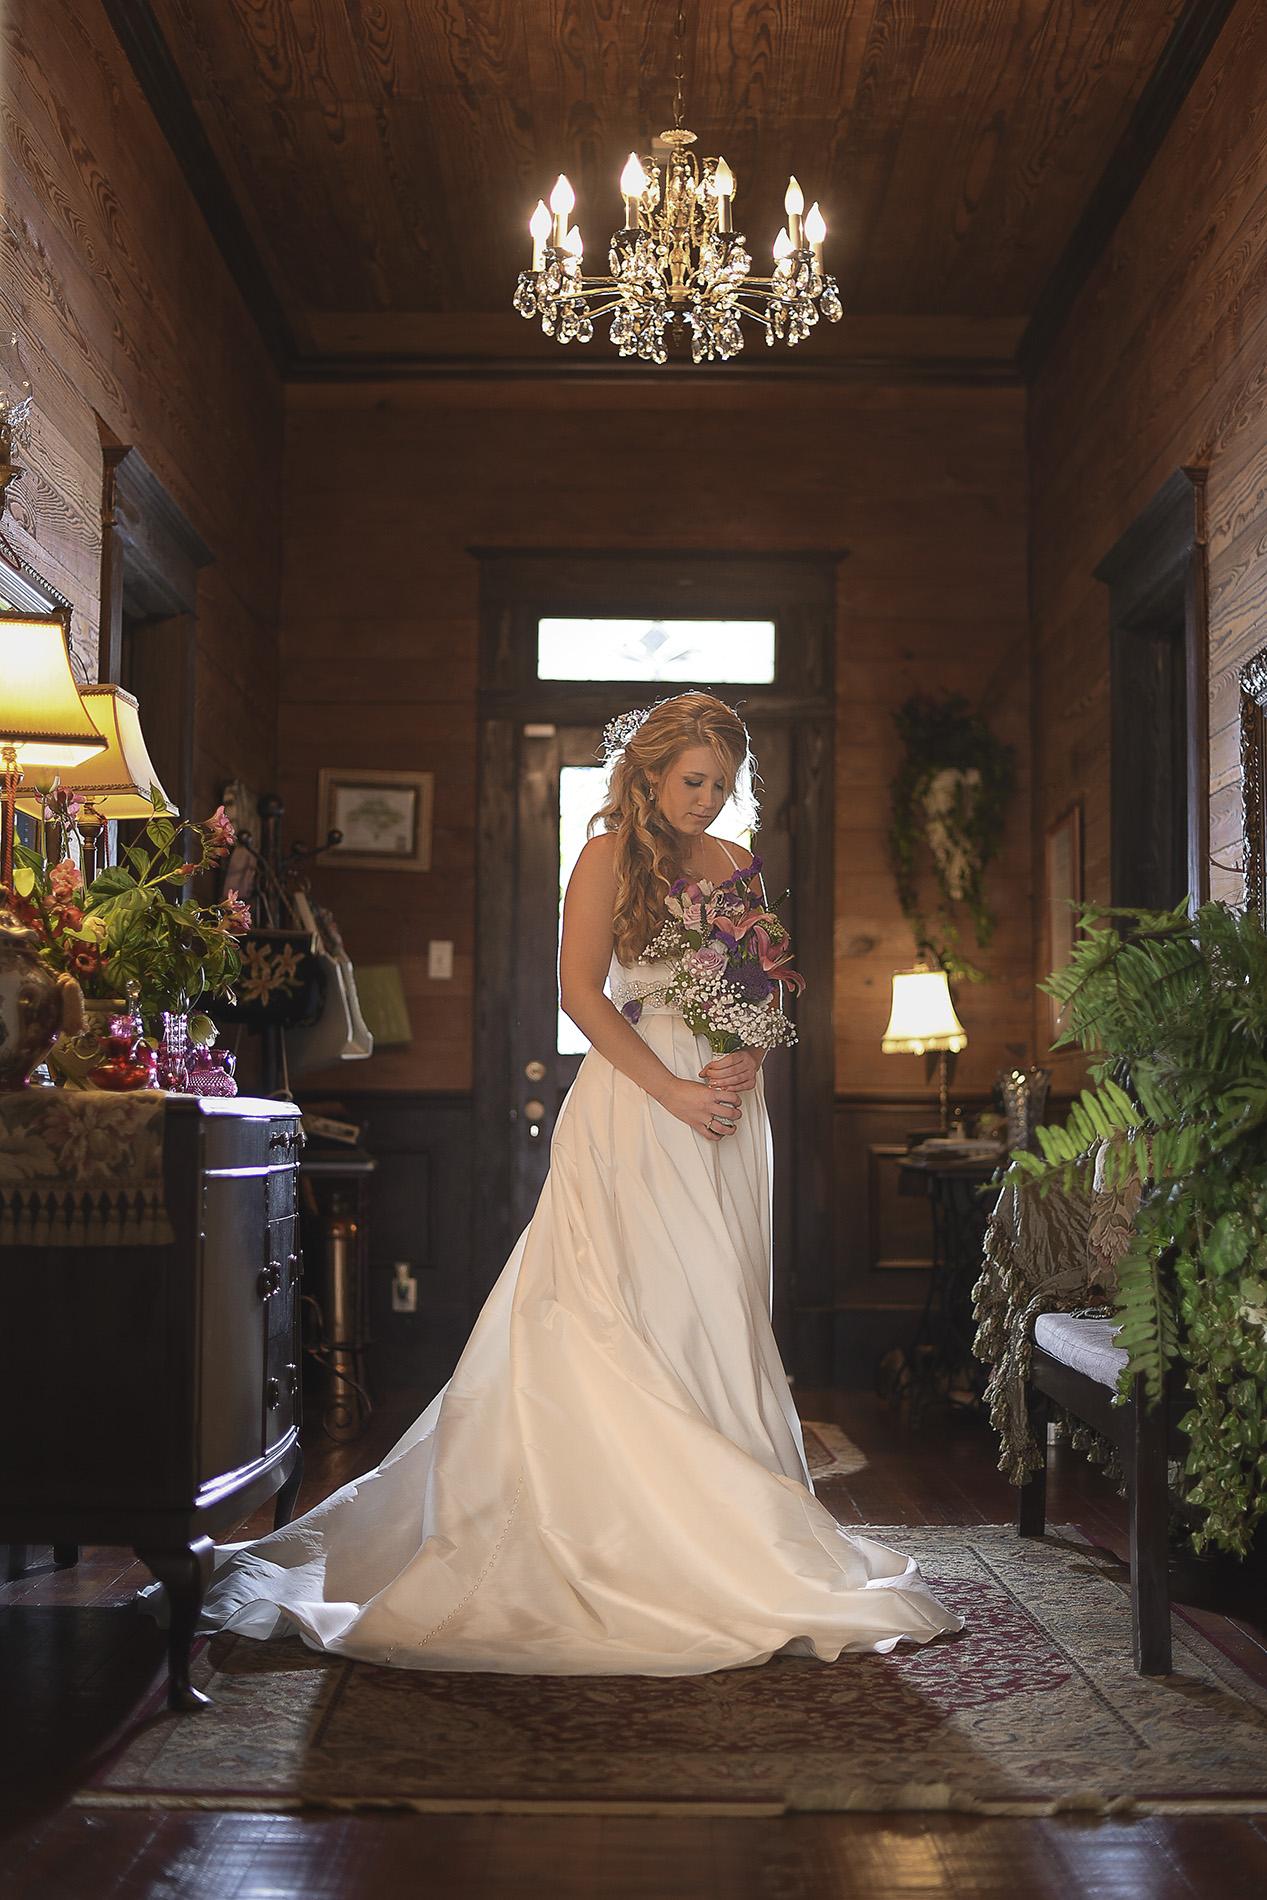 Oak-tree-manor-top-rated-houston-classy-wedding-venue-photo-1